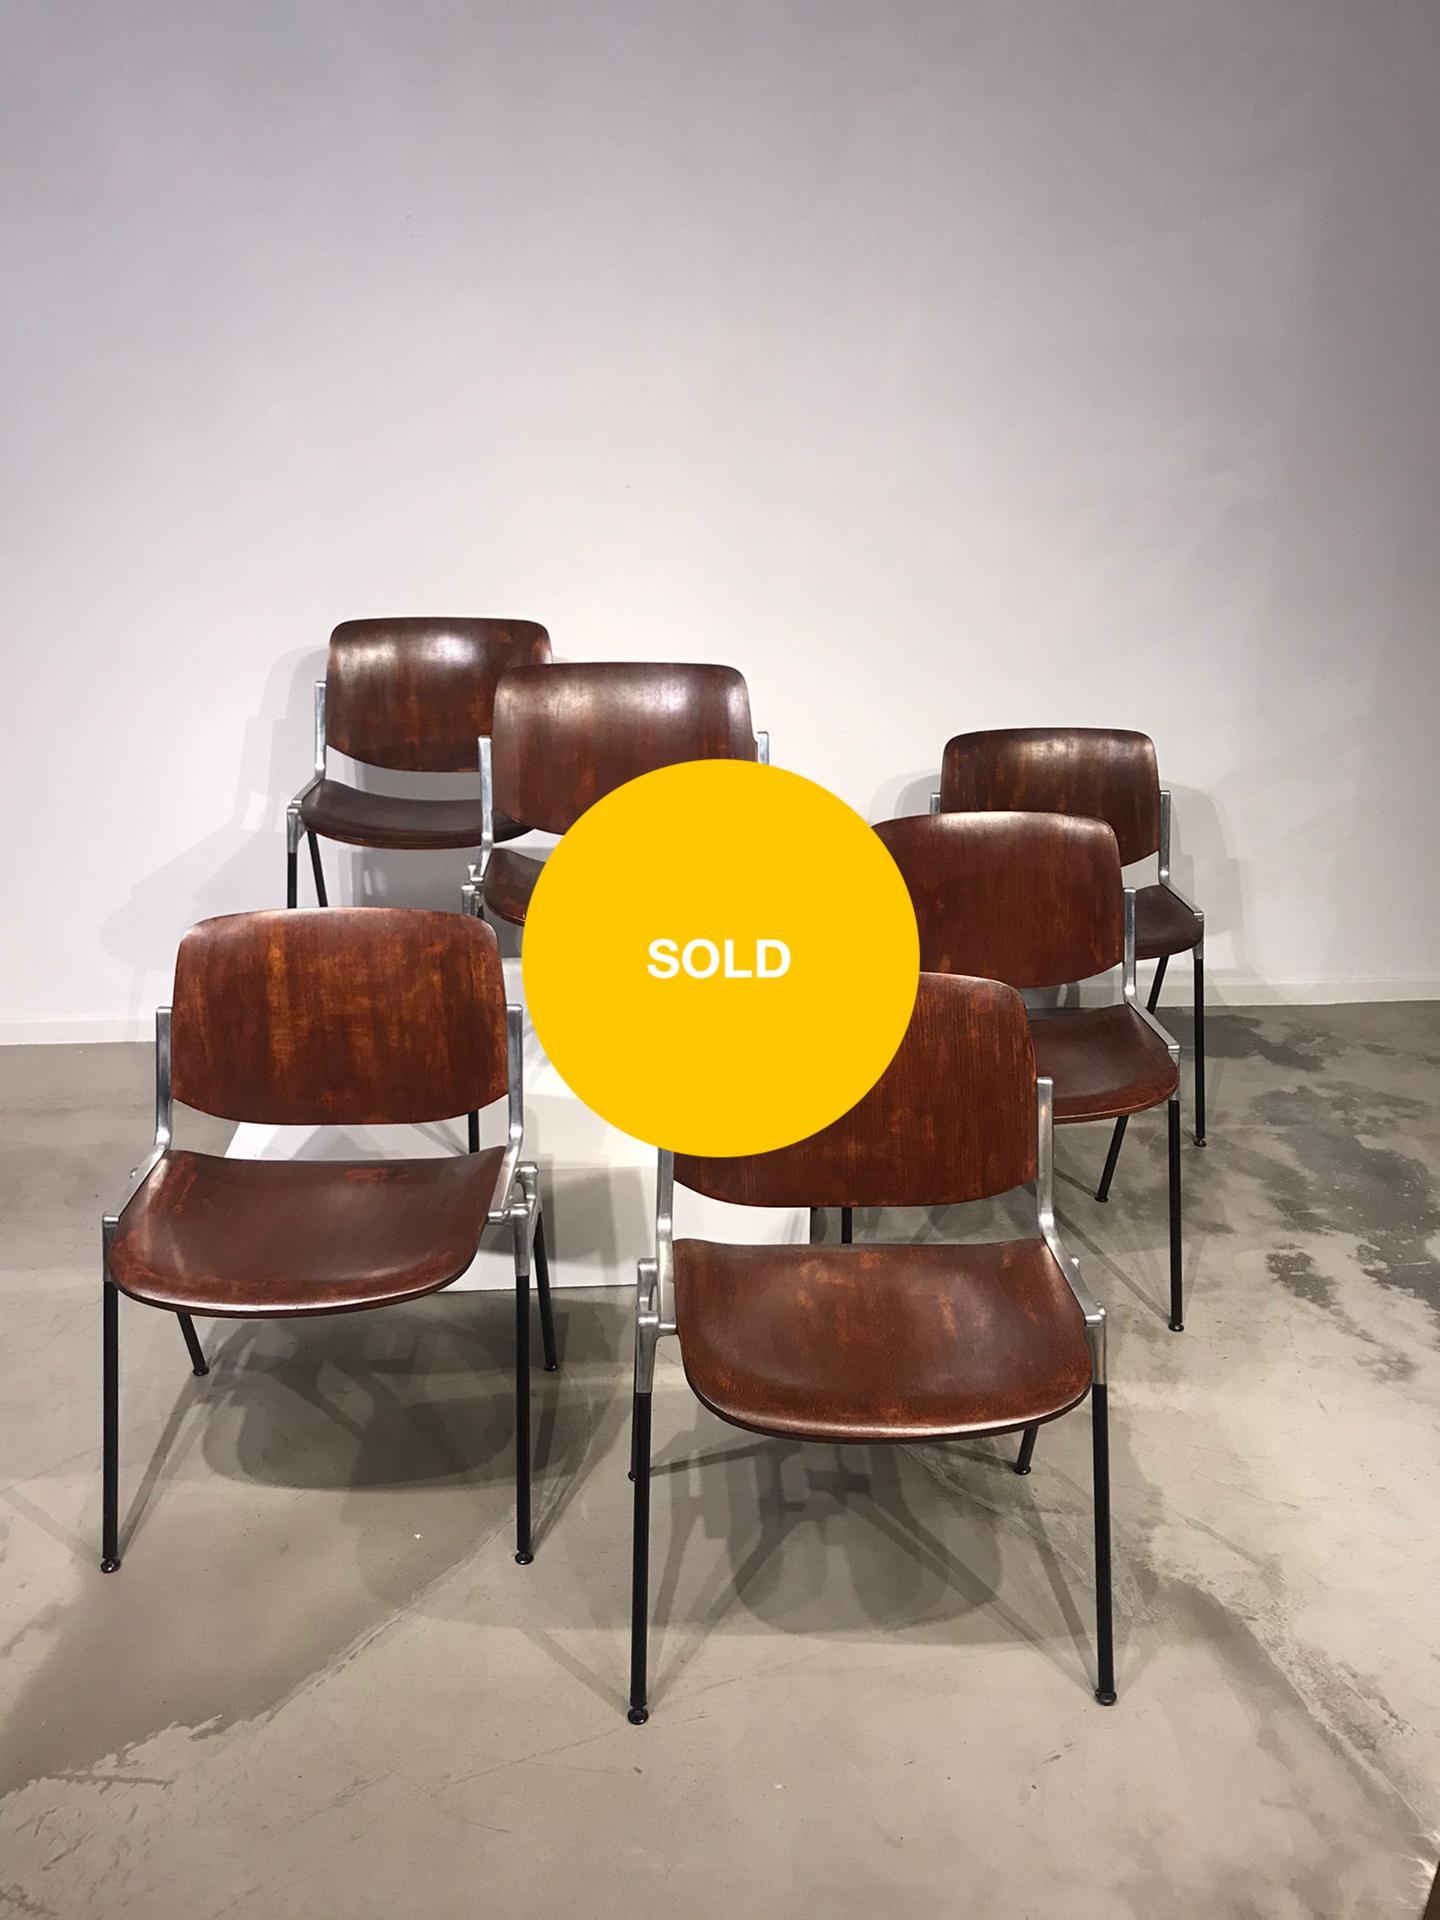 Italian Castelli chairs